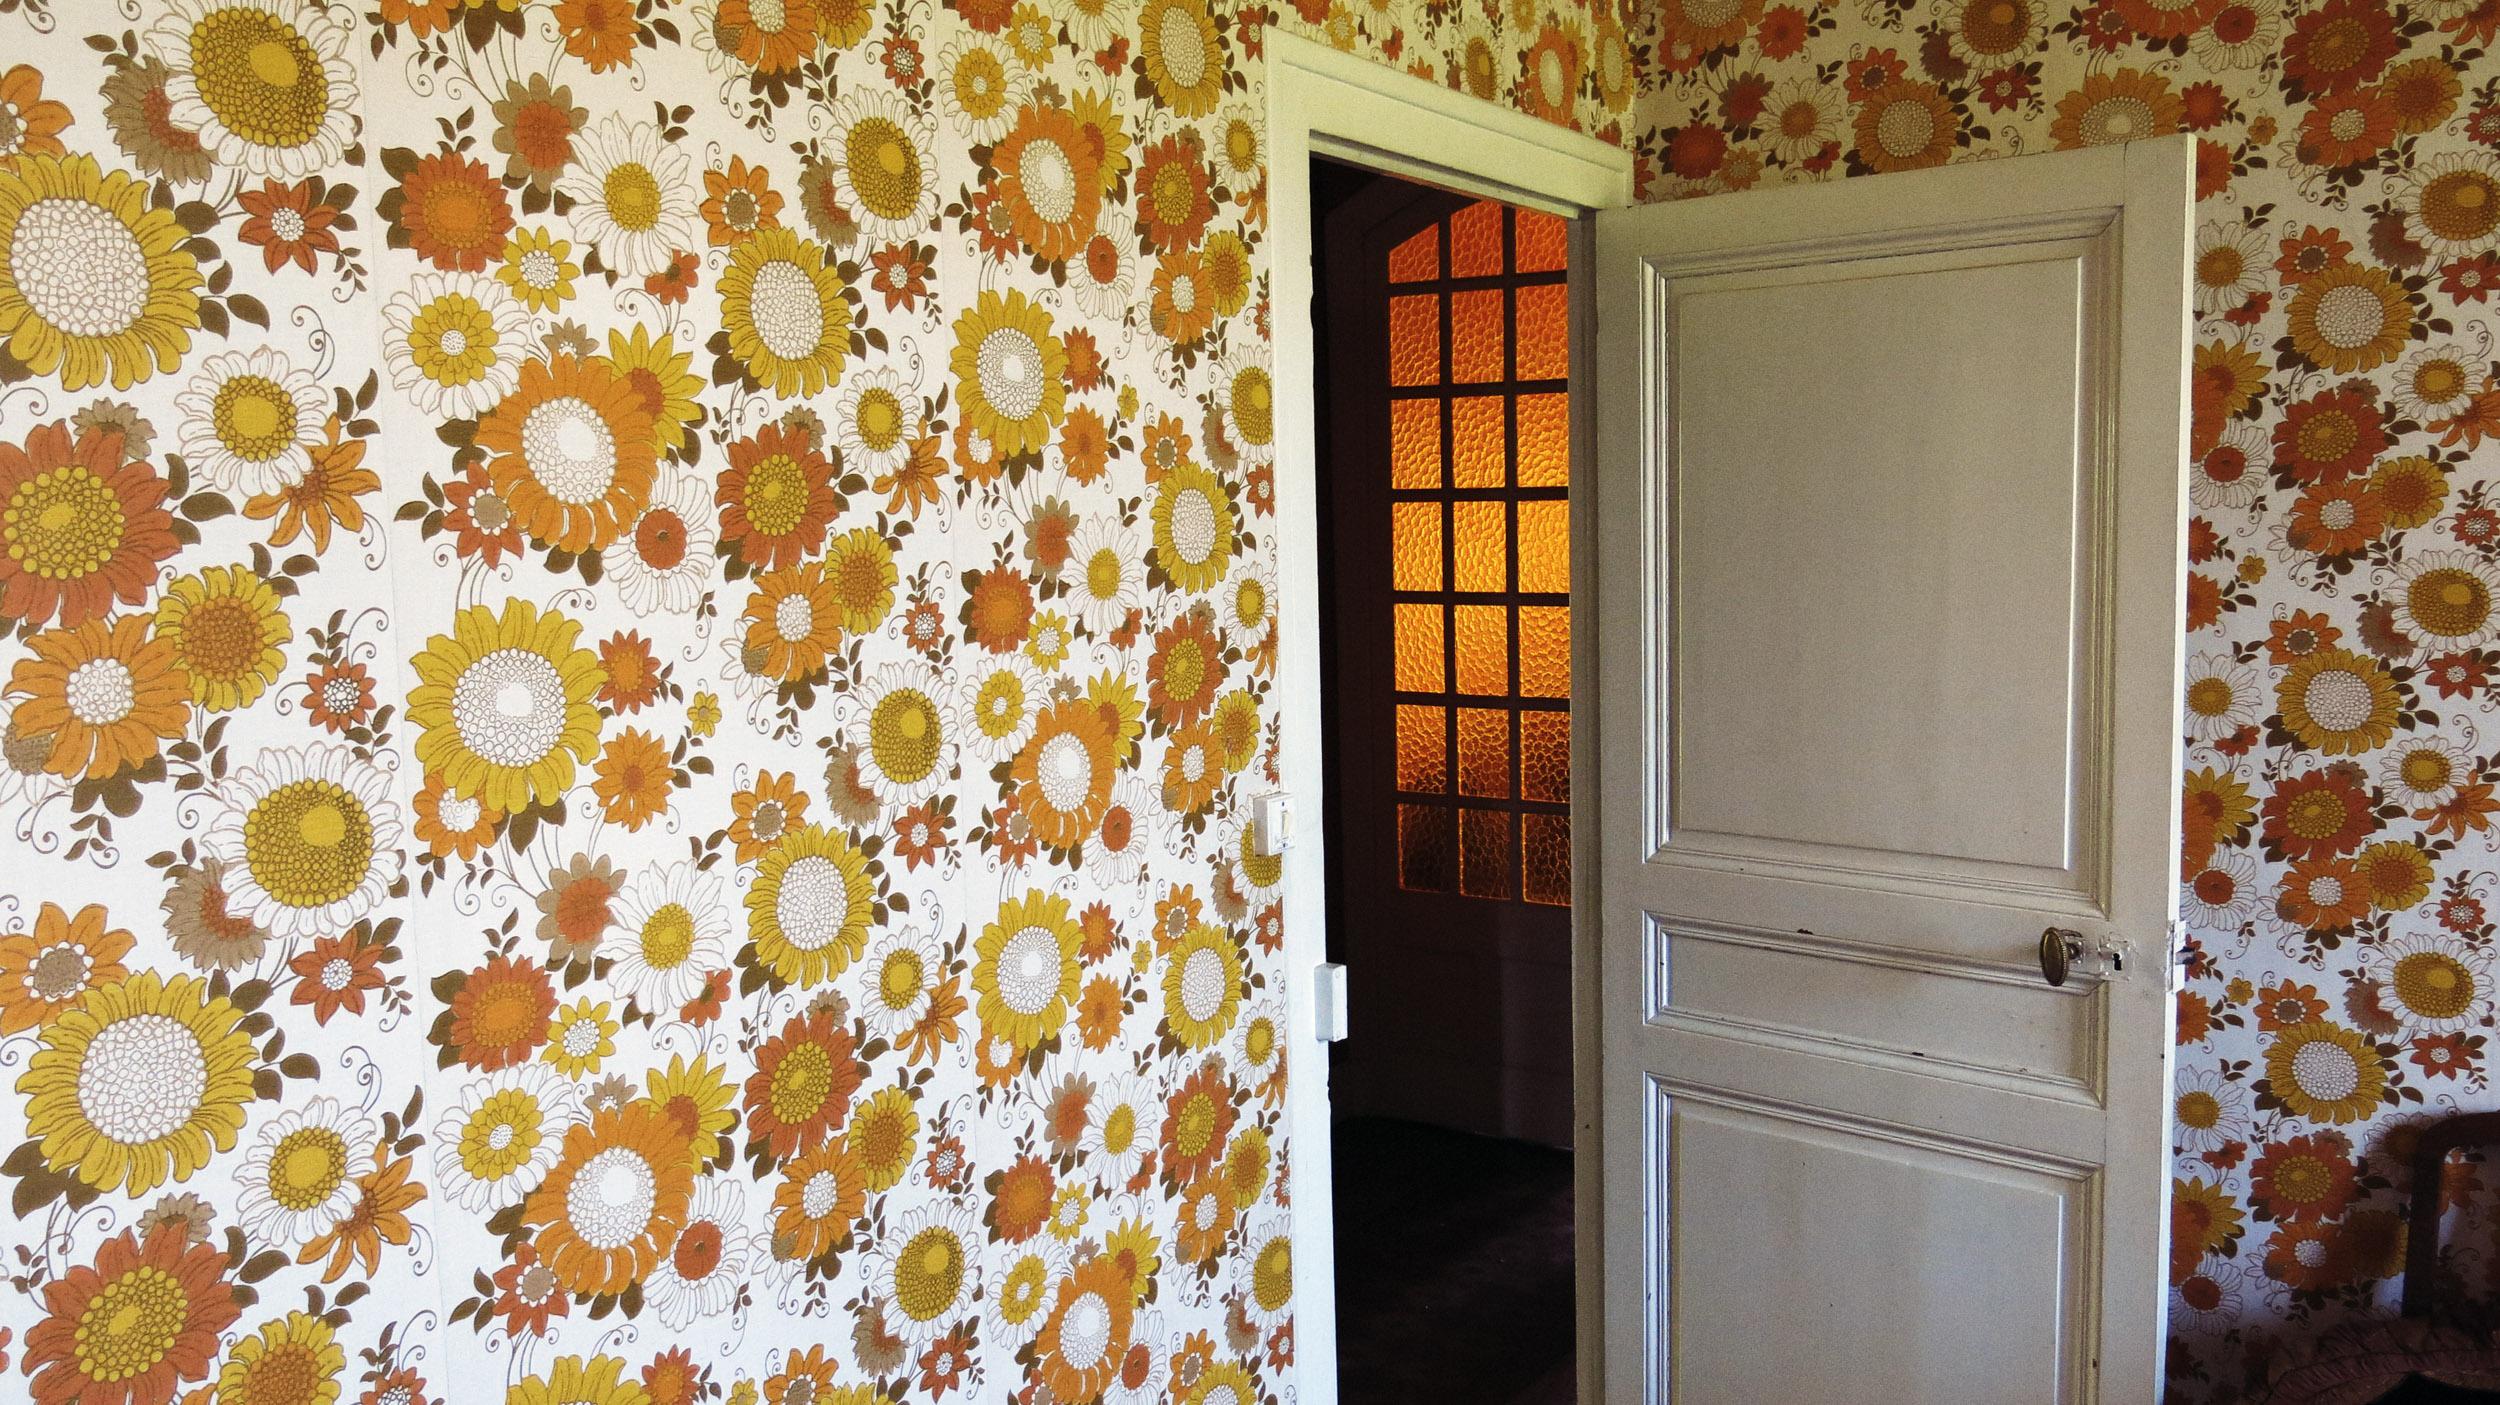 <p><span>Fleurs au mur</span>, .<br></p>